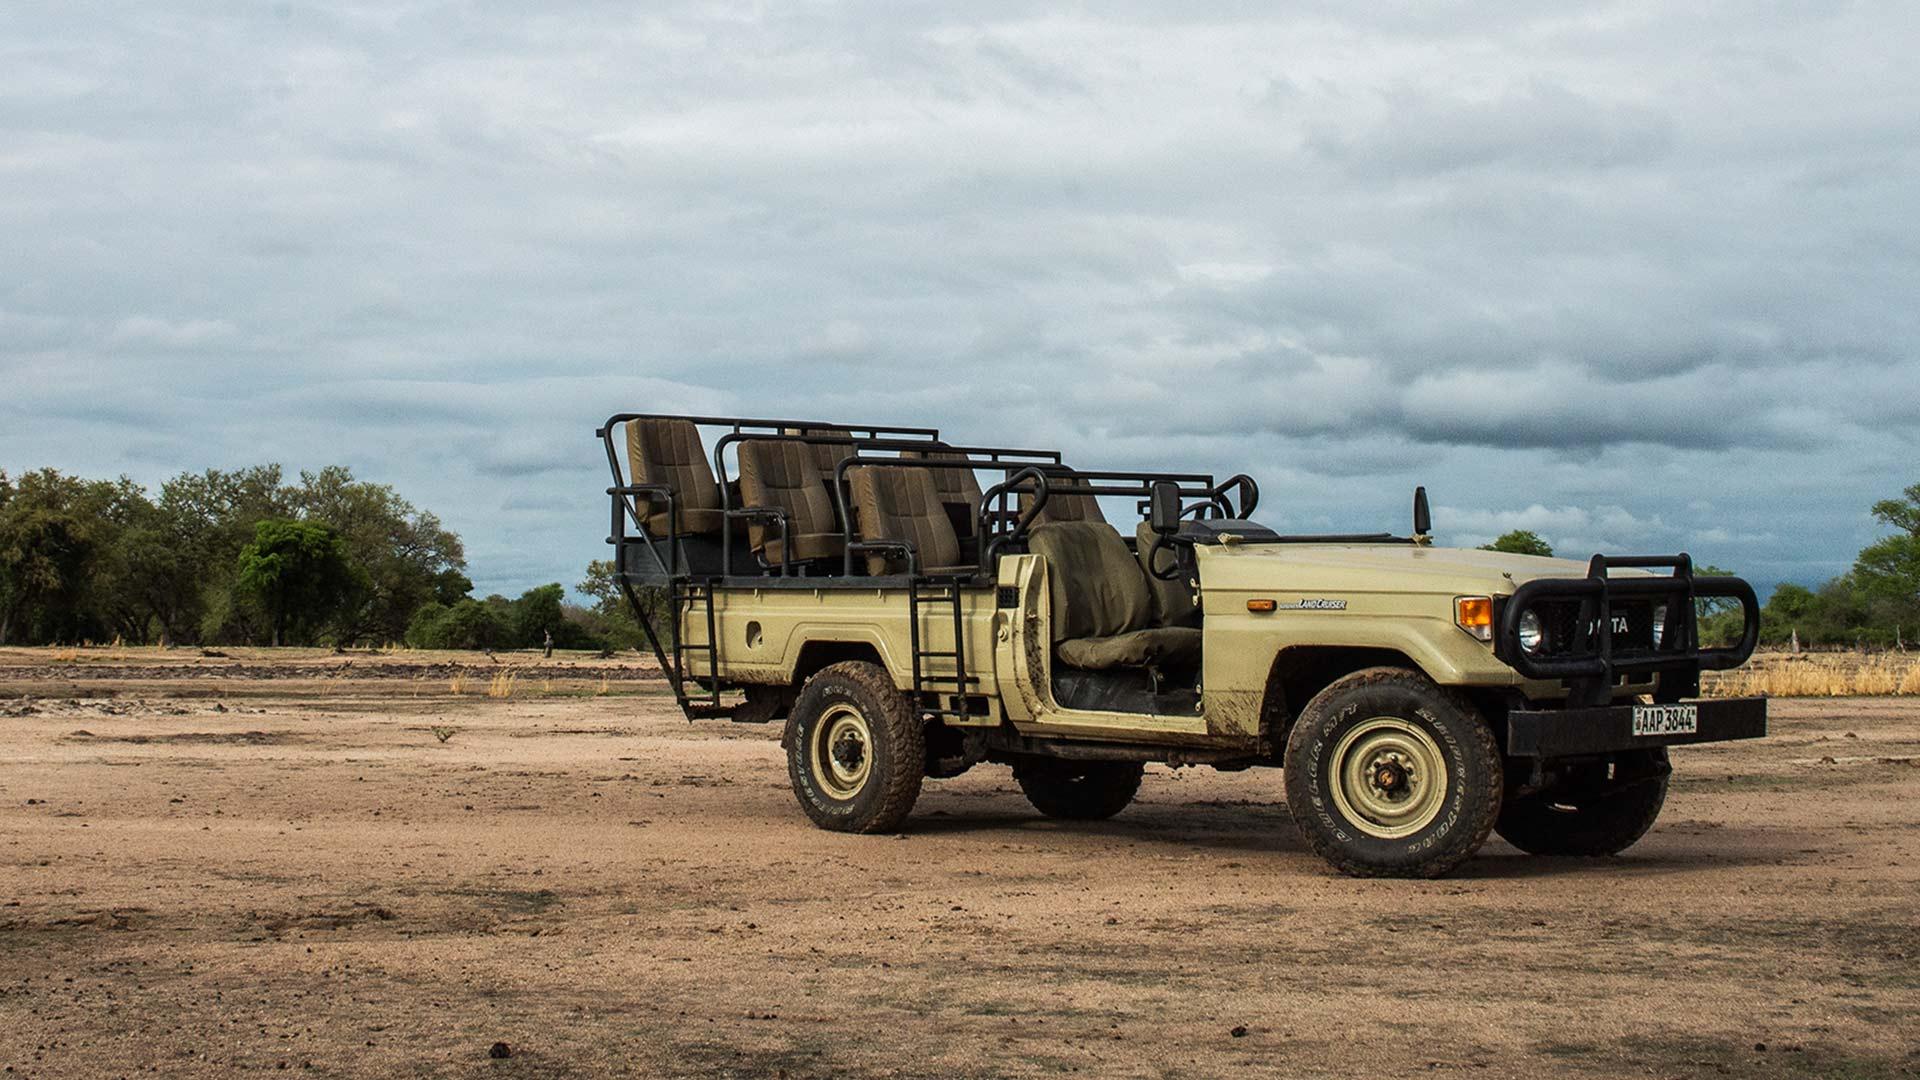 Jeep safari | safari southern Africa tour